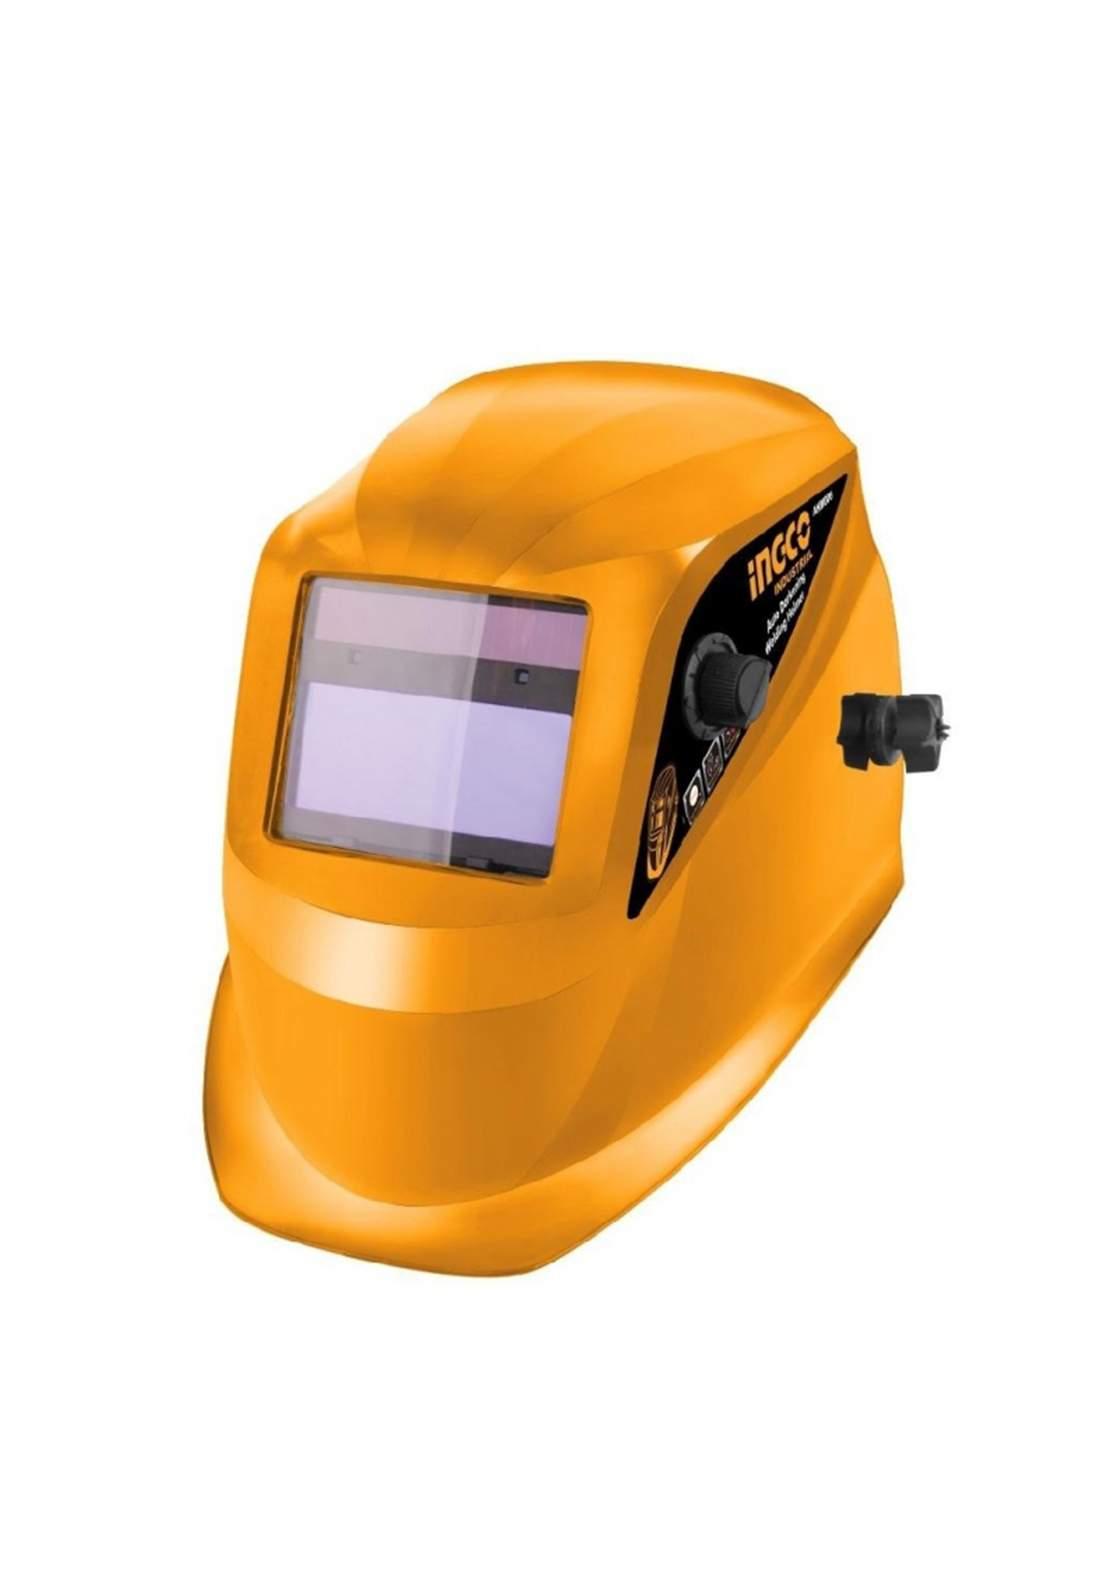 Ingco AHM006 Screen Electric Welding ahm006 قناع لحام